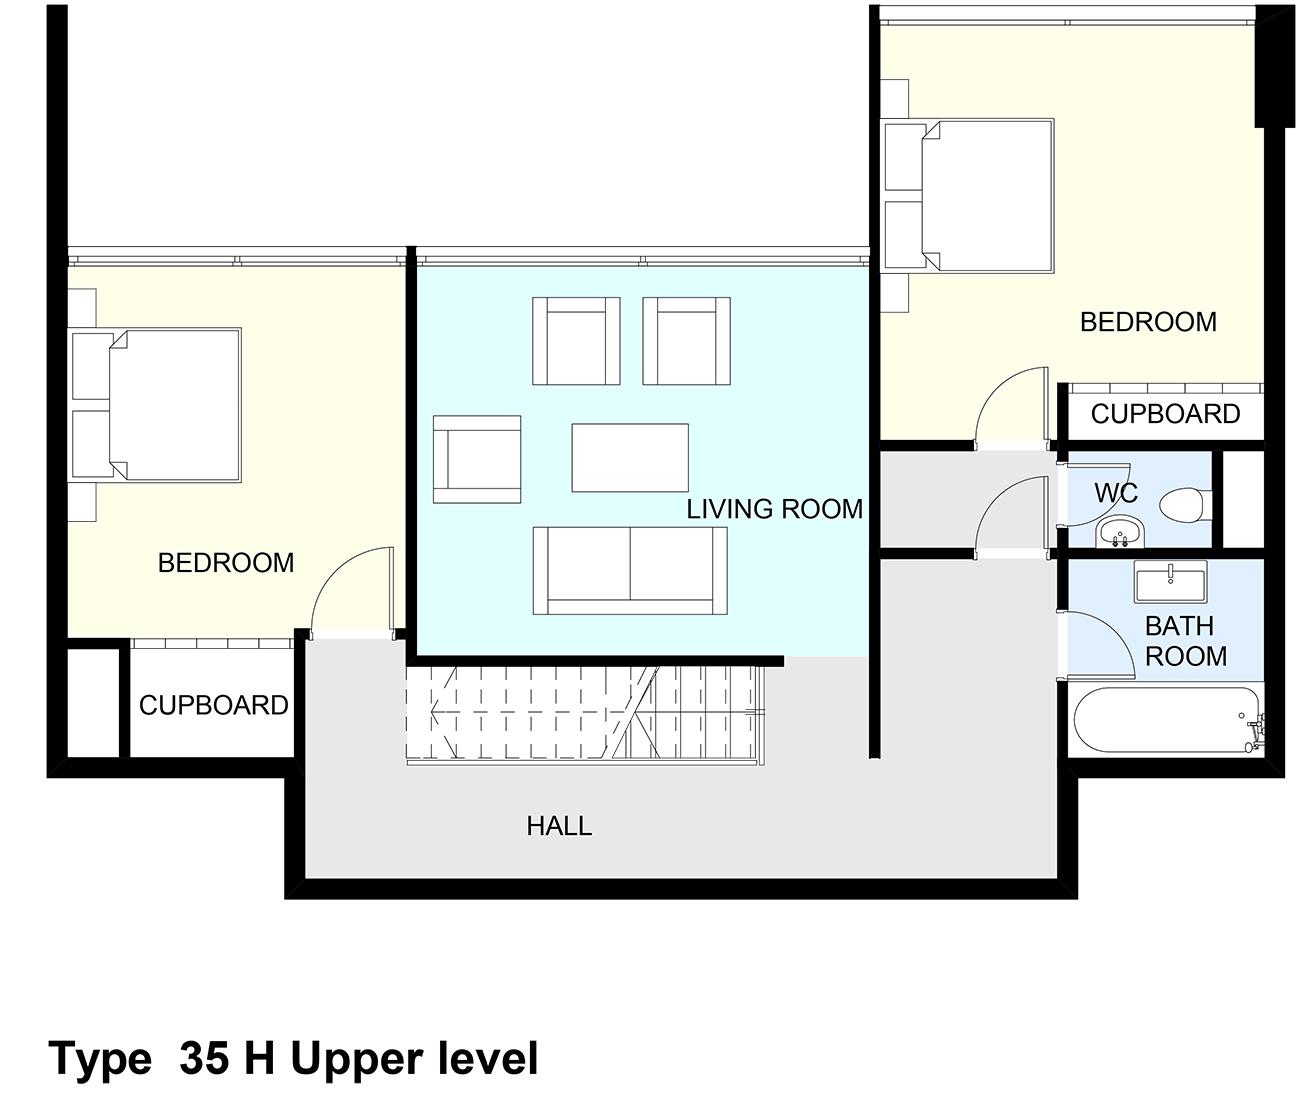 Type__35_H_Upper_level